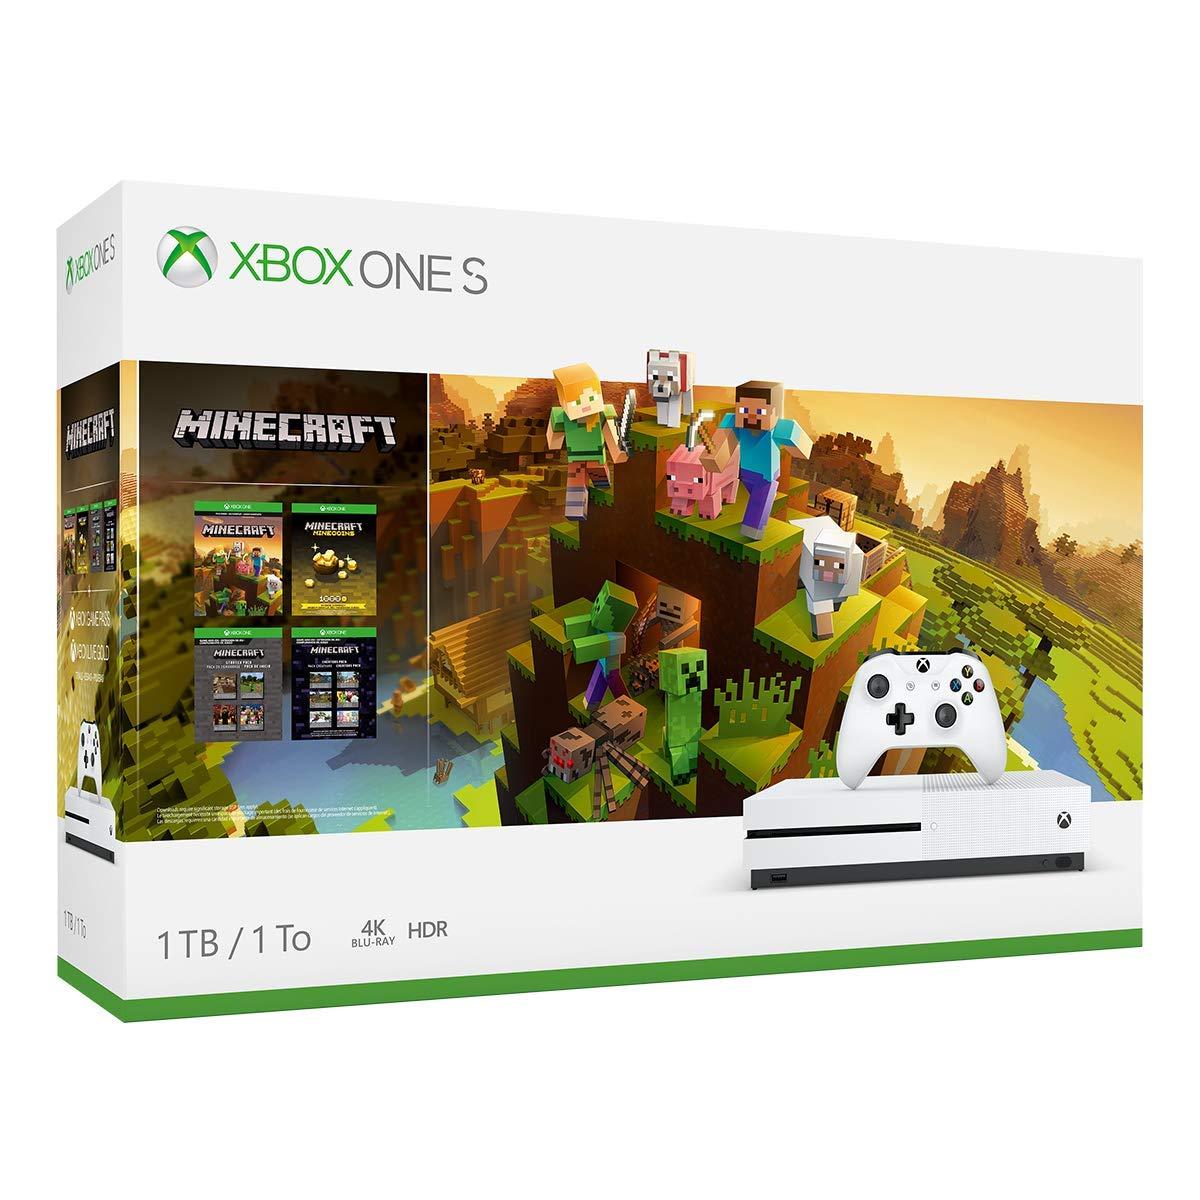 Xbox One S 1TB Console - Minecraft Creators Bundle (Renewed) by Microsoft (Image #2)